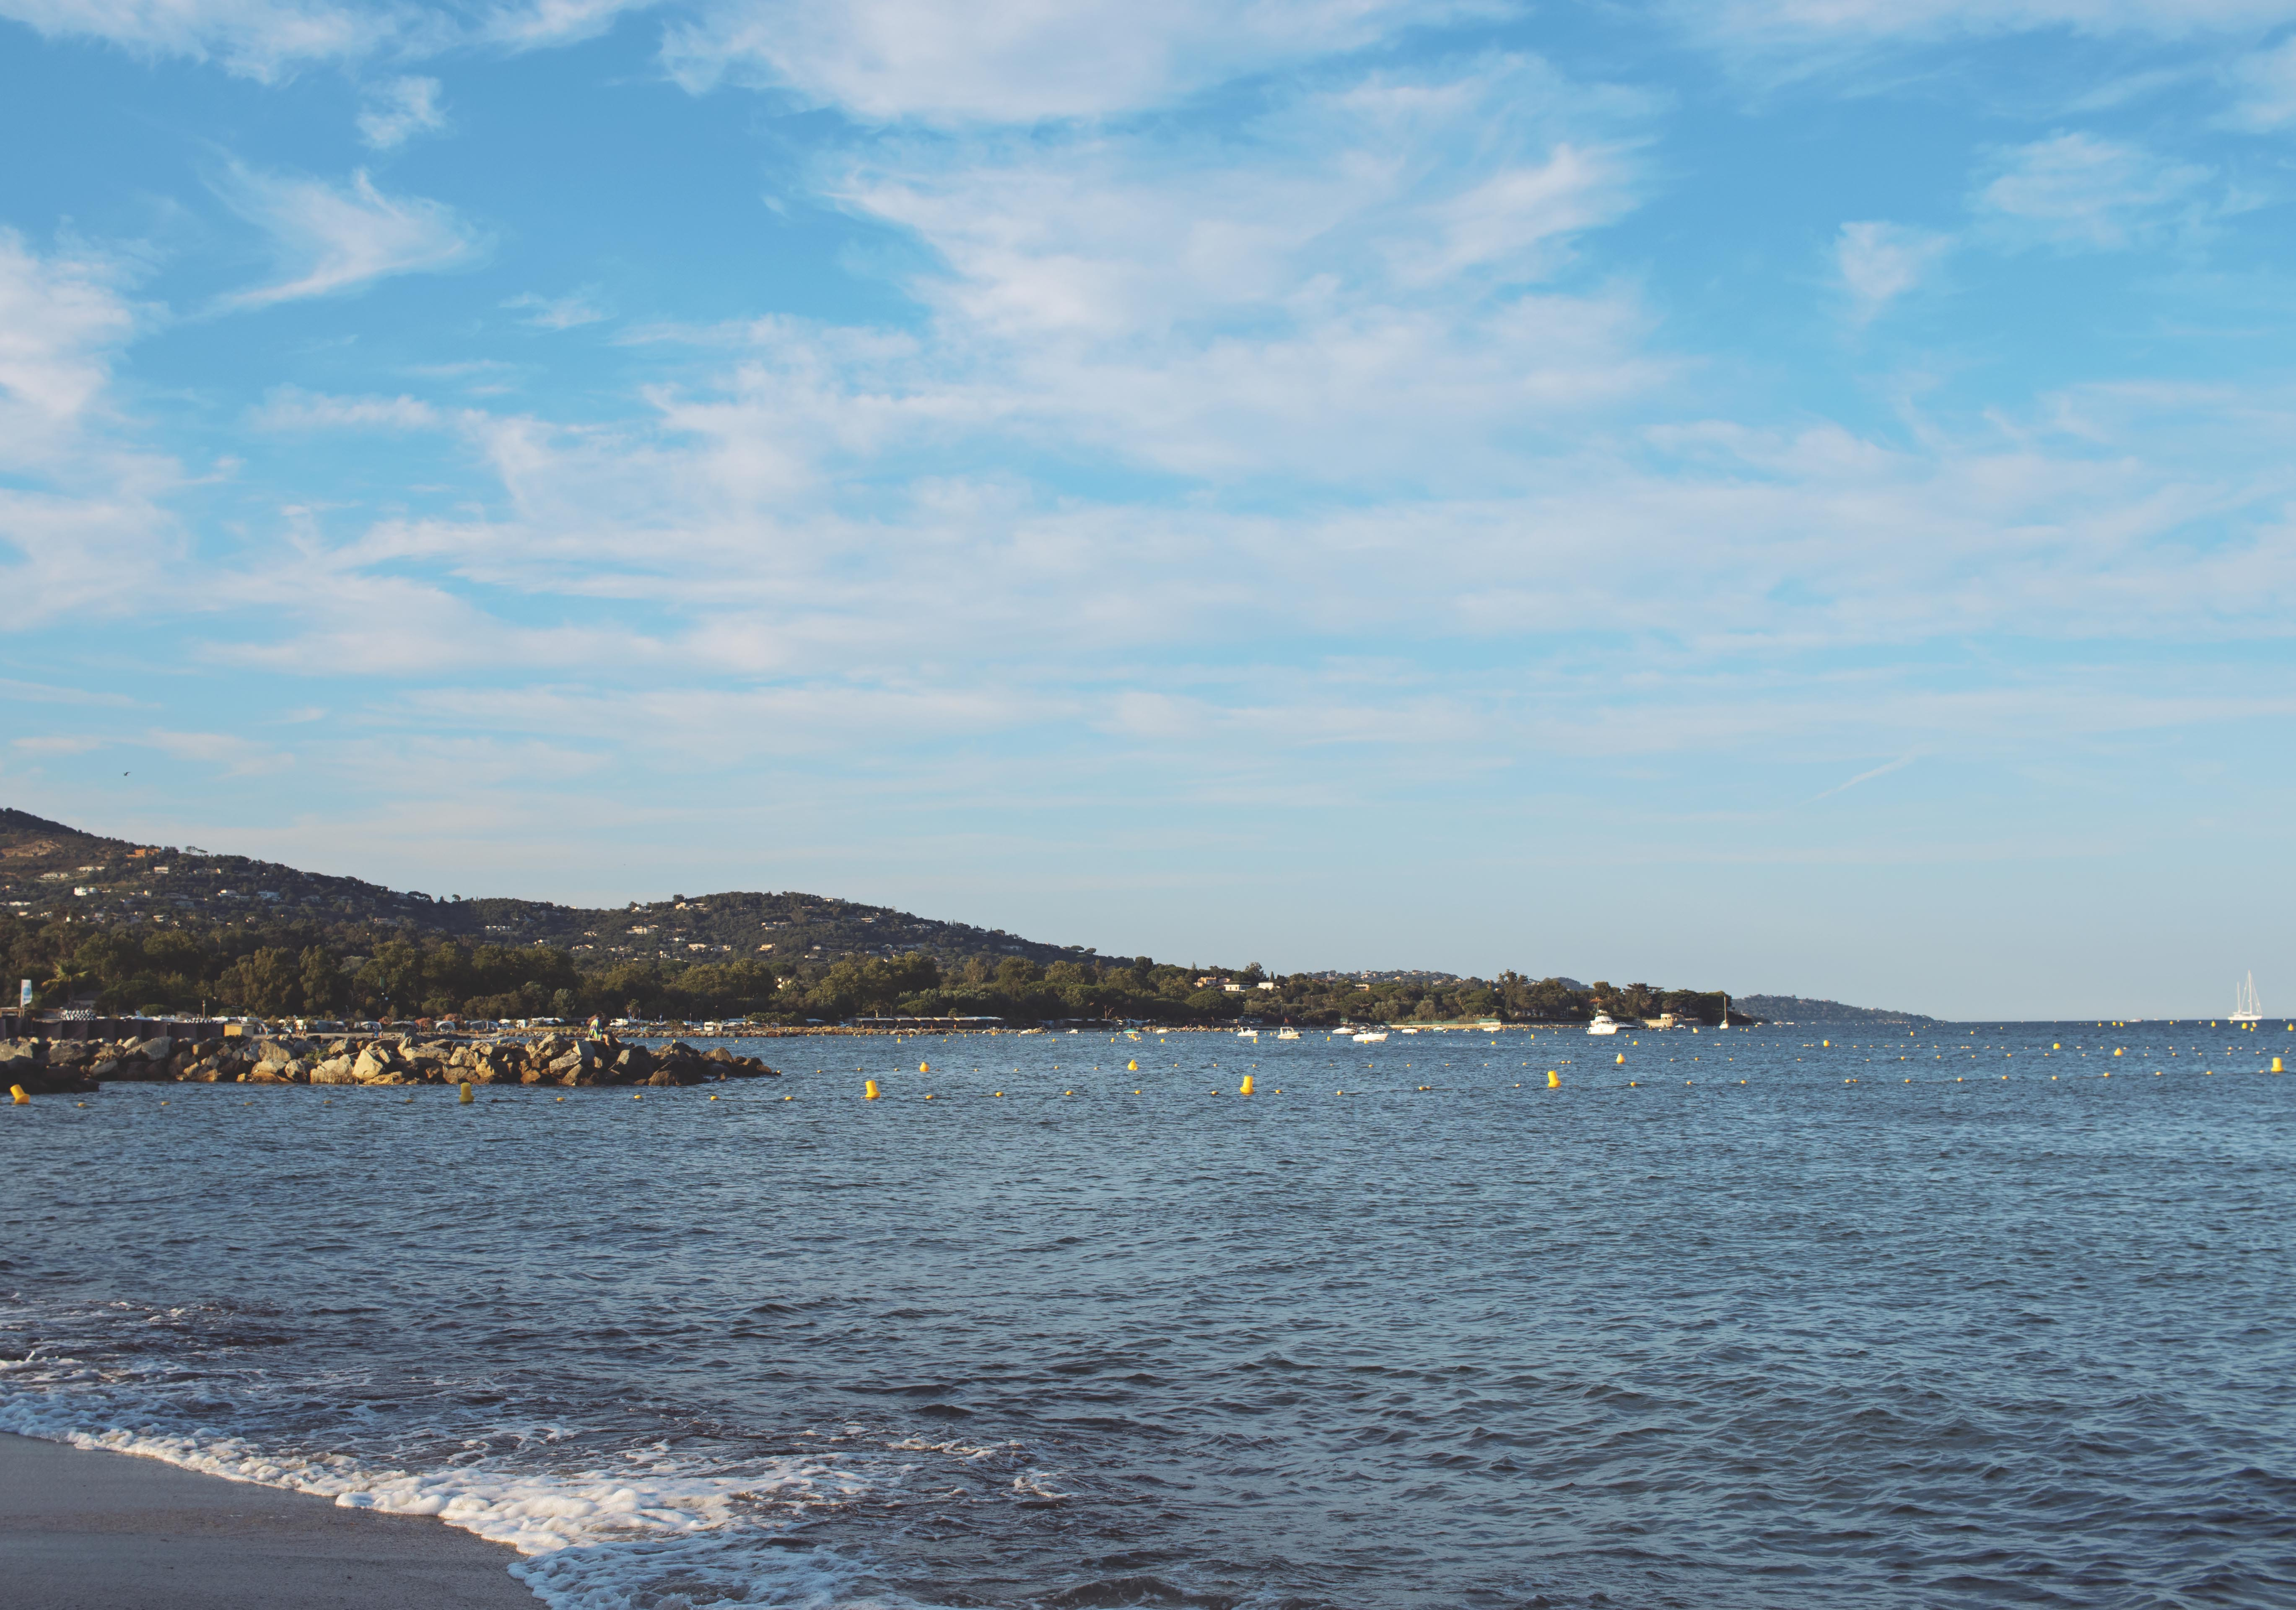 The Sun Holiday Resort